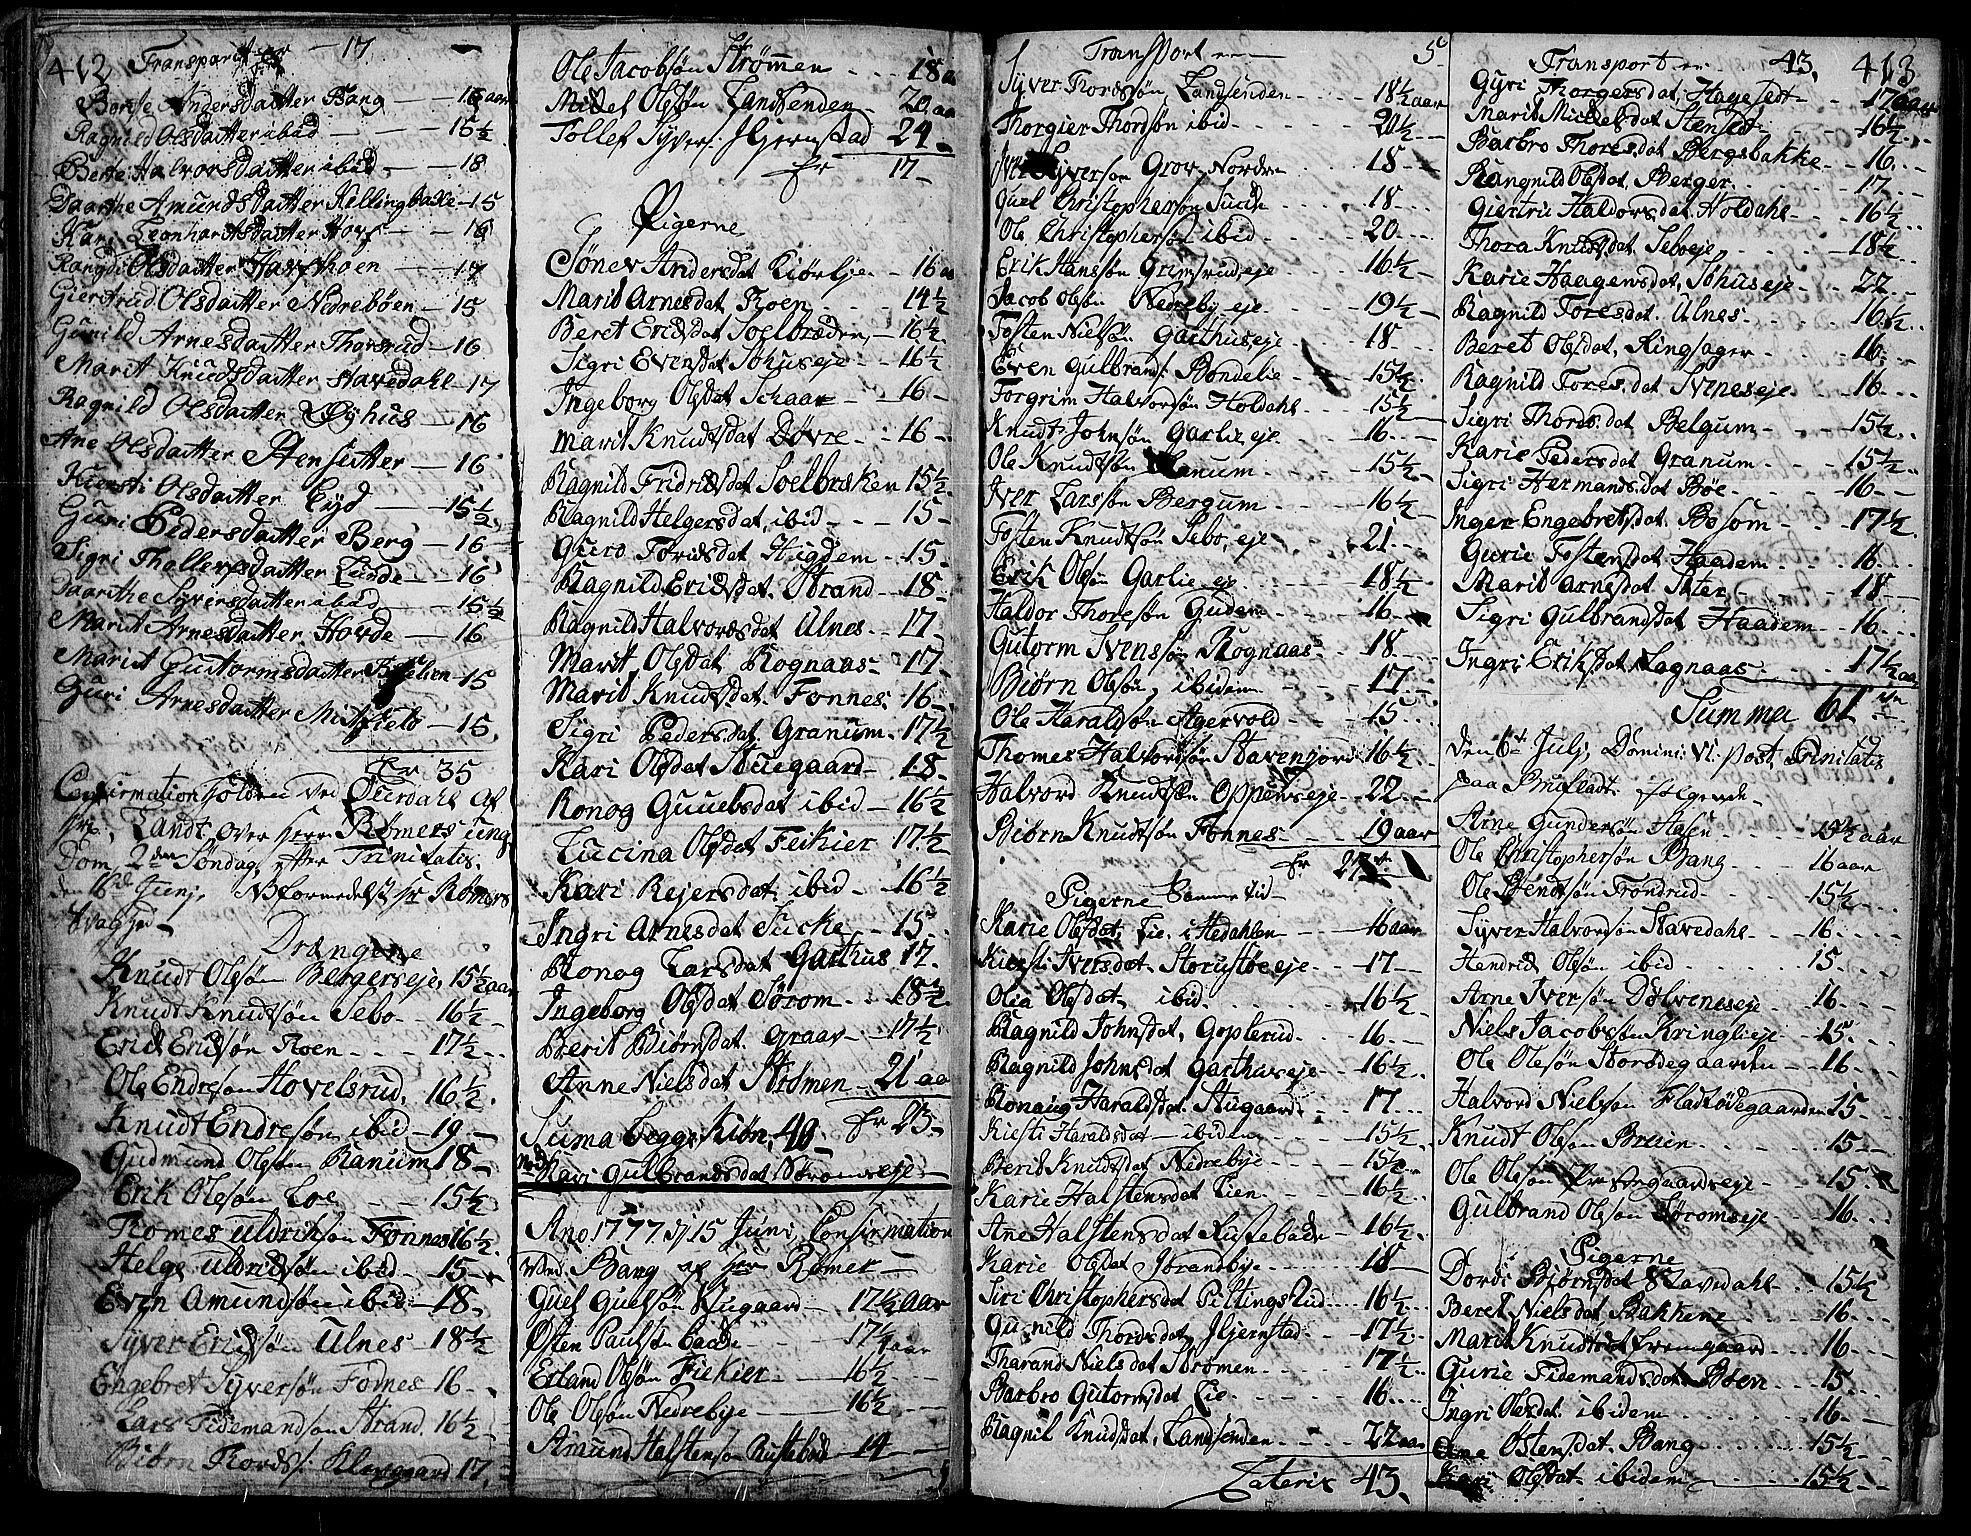 SAH, Aurdal prestekontor, Ministerialbok nr. 5, 1763-1781, s. 412-413